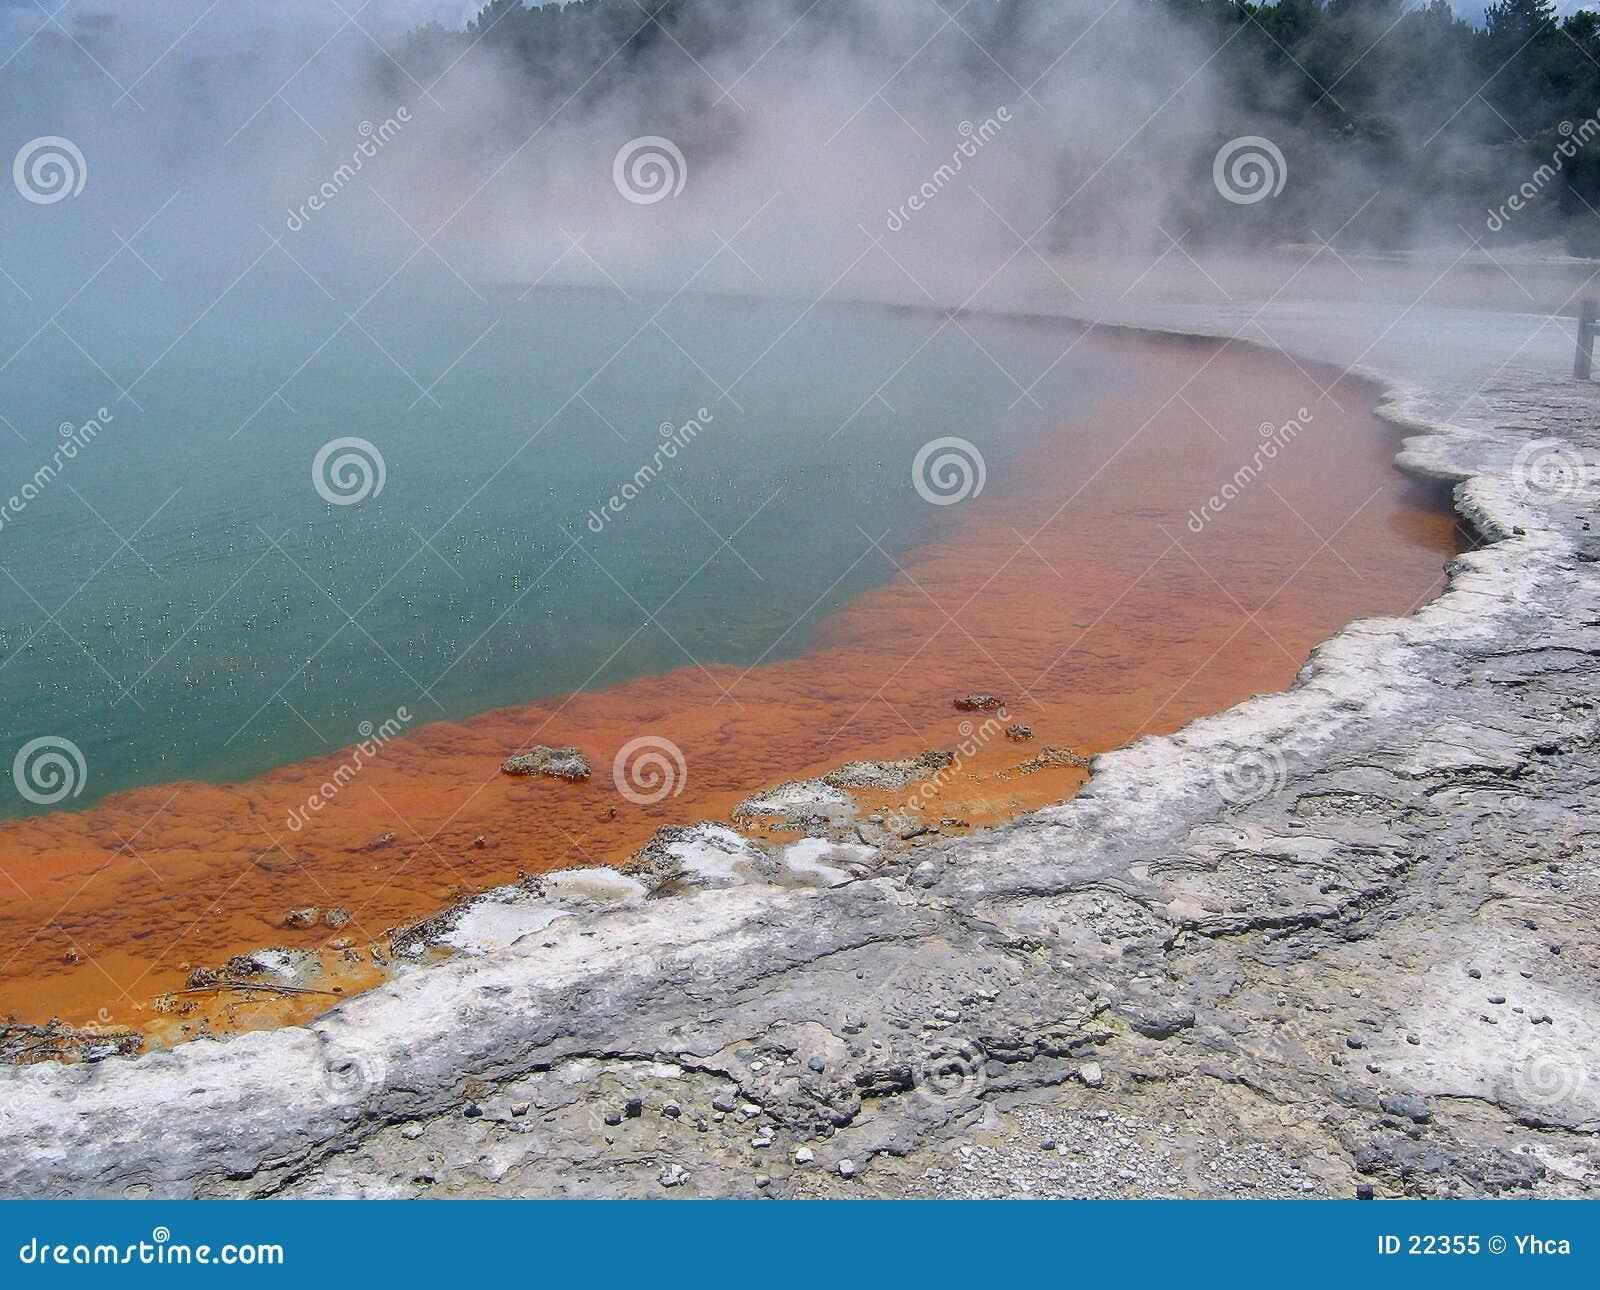 Download 香槟地热自然池 库存图片. 图片 包括有 春天, 定金, 北部, 本质, 热液, 爆发, 西兰, 火山口, 二氧化物 - 22355